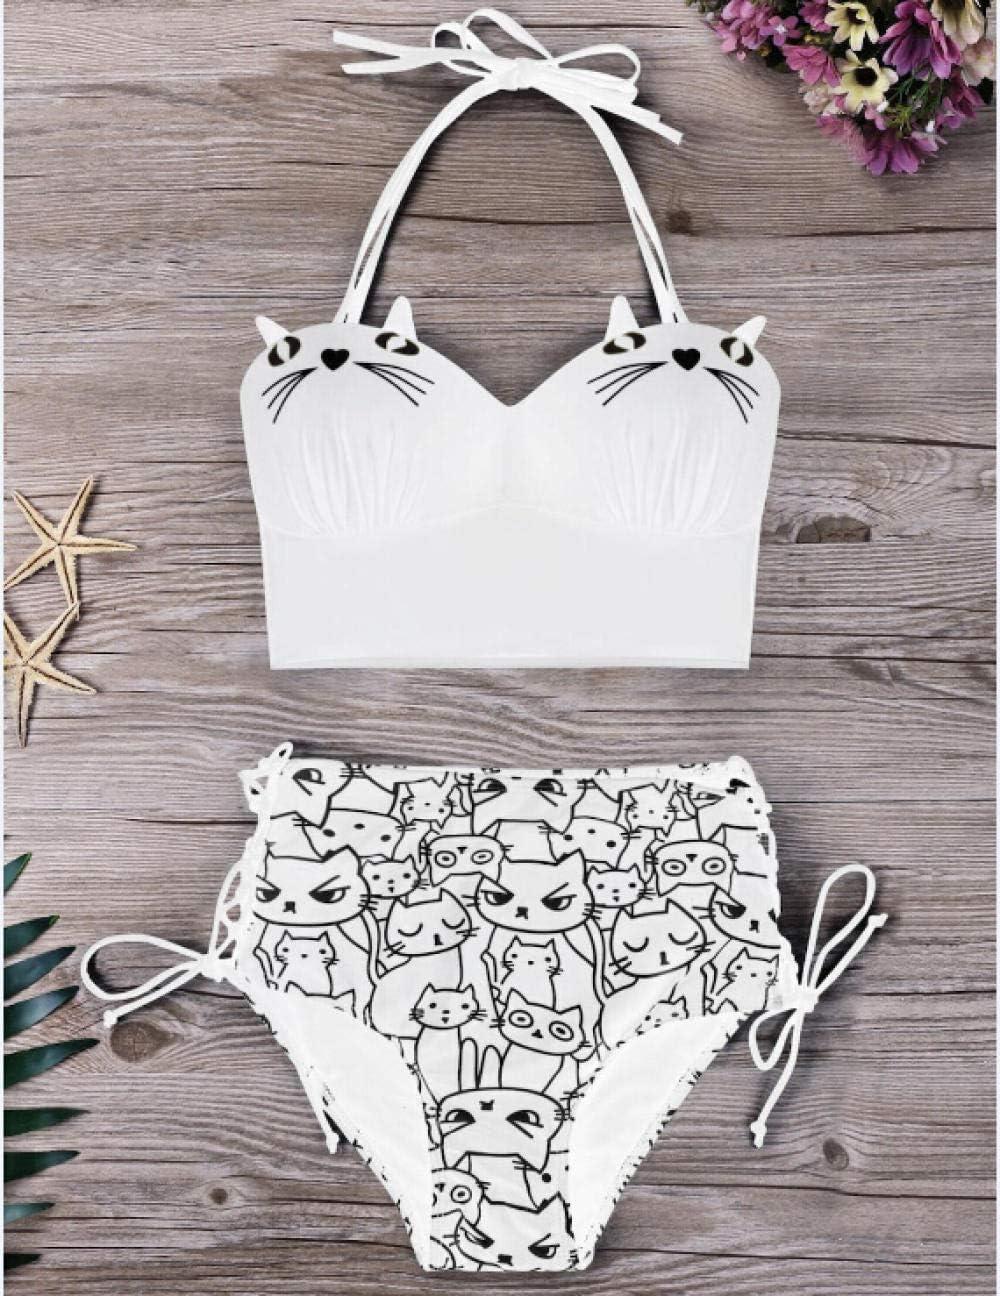 New Women Retro Swimsuit High Waist Swimsuit Bandage Halter Bikini Set Cartoon Cat Print Bathing Suit High Waist Beachwear White